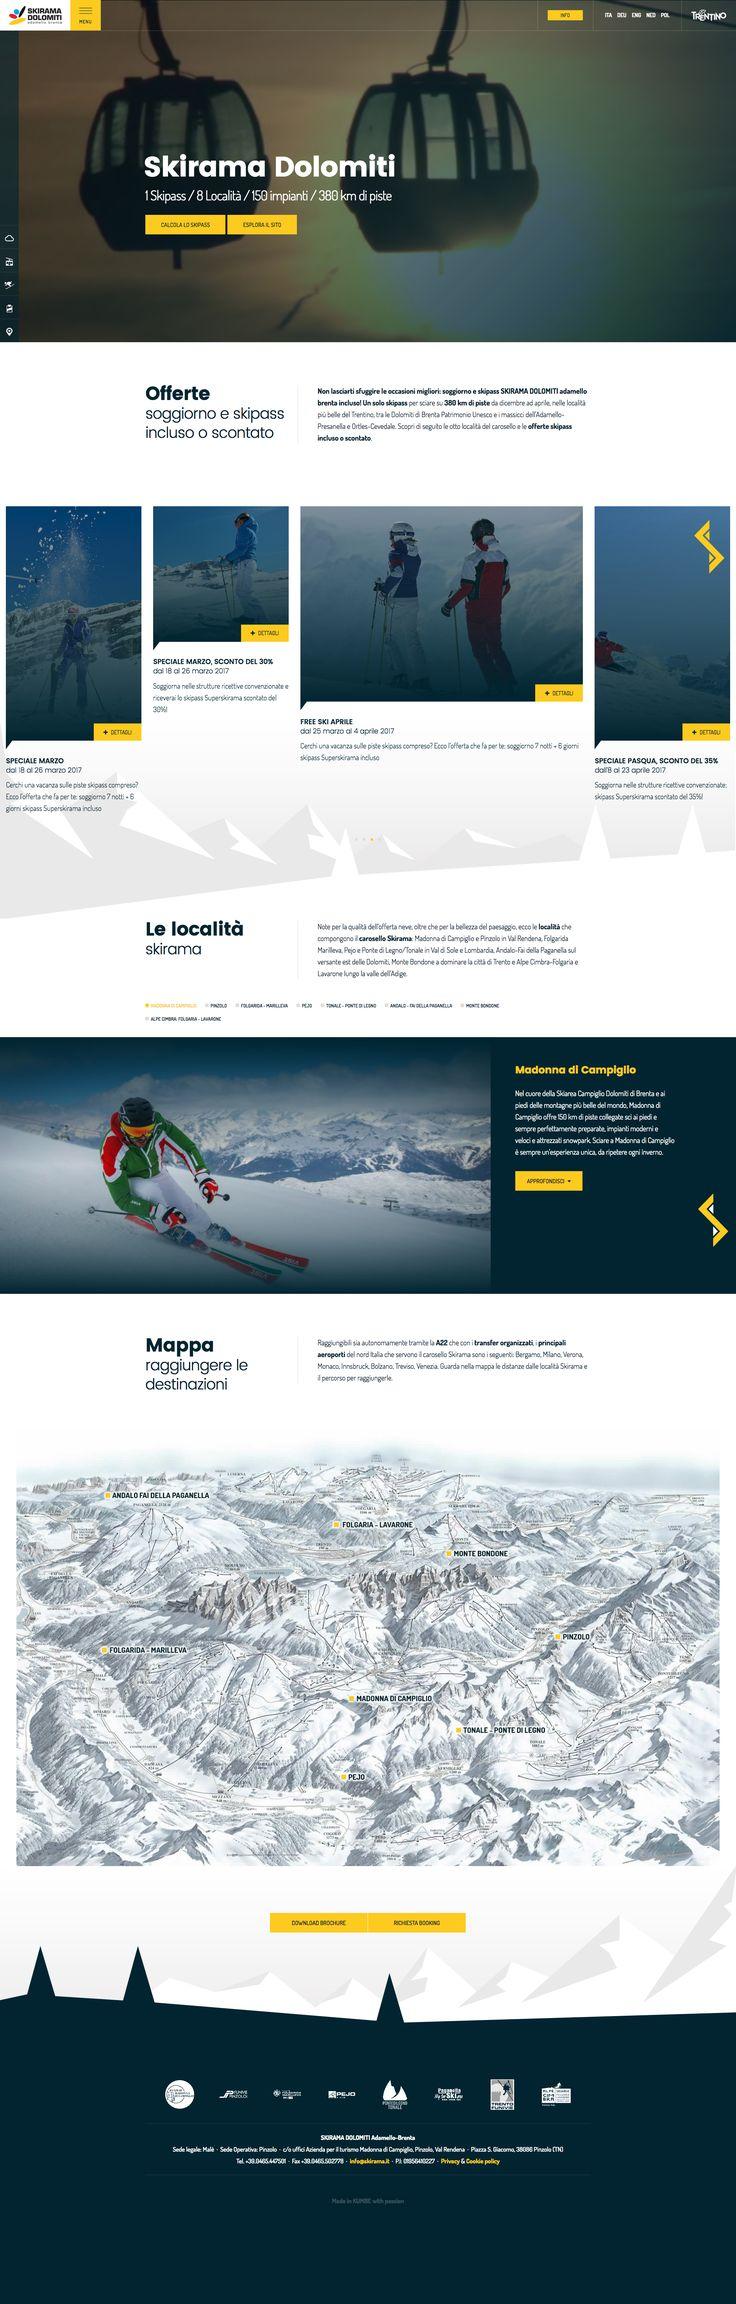 #skiramadolomiti www.skirama.it #Kumbe #portfolioweb #webdesign #website #responsivedesign #responsive #new #sci #ski #snow #snowboard #sun #fun #love #family #MadonnadiCampiglio #Pinzolo #ValRendena #Trentino #Folgarida #Marilleva #Pejo #PontediLegno #Tonale #ValdiSole #Lombardia #Andalo #FaidellaPaganella #MonteBondone #Bondone #Trento #AlpeCimbra #Folgaria #Lavarone #transfer #BrentaDolomites #Dolomiti #DolomitiDiBrenta #Turismo #skirama #natura #skipass